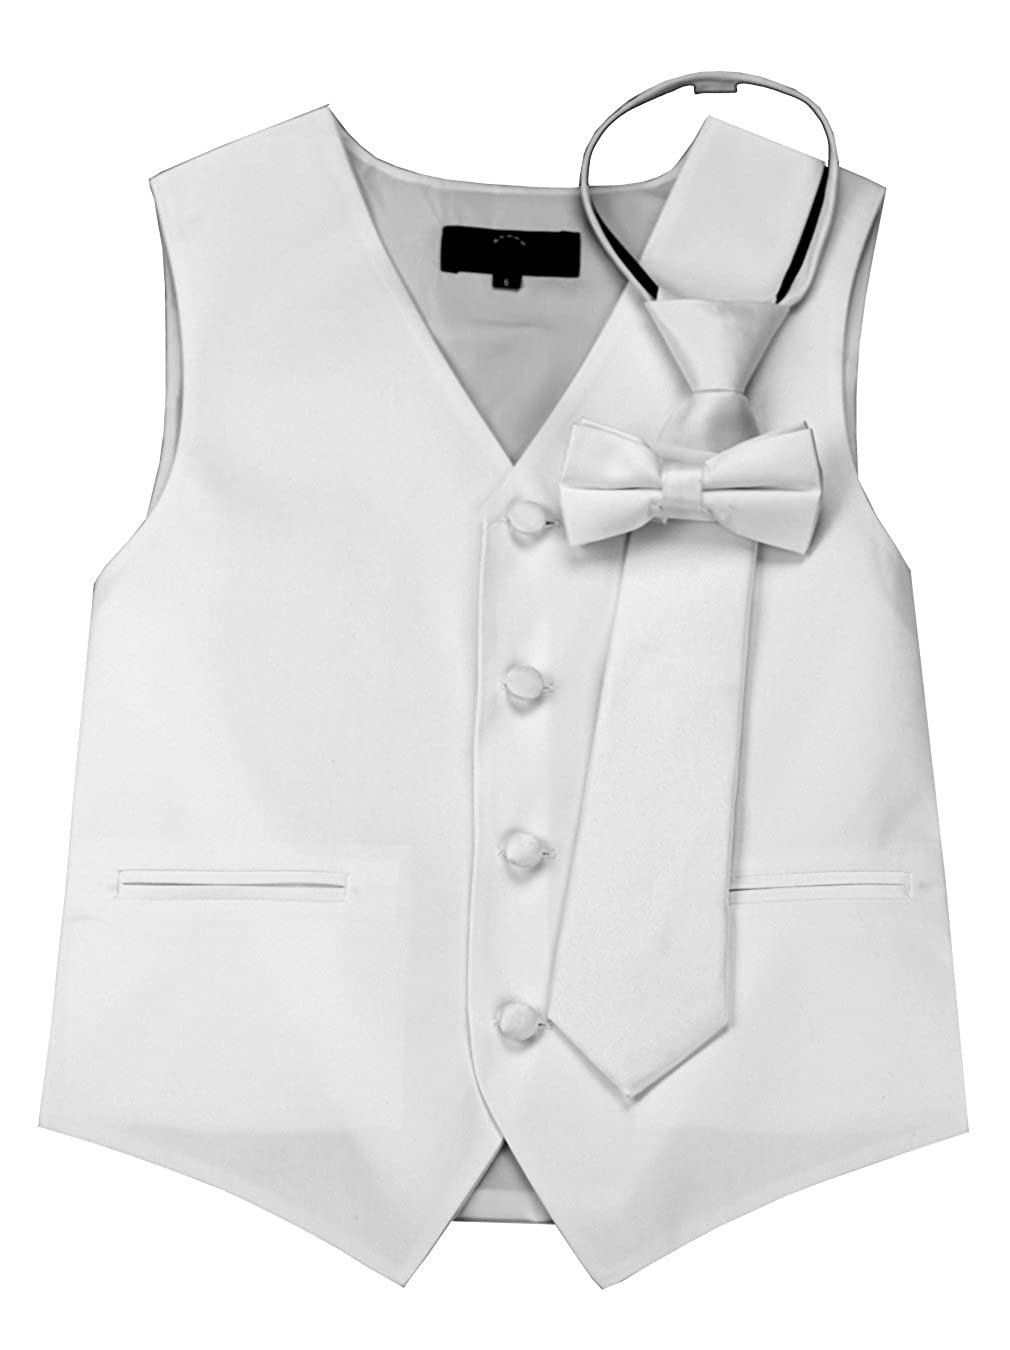 Brand Q Boy's Tuxedo Vest, Zipper Tie & Bow-Tie Set in White Brand Q Boy's Tuxedo Vest B10A